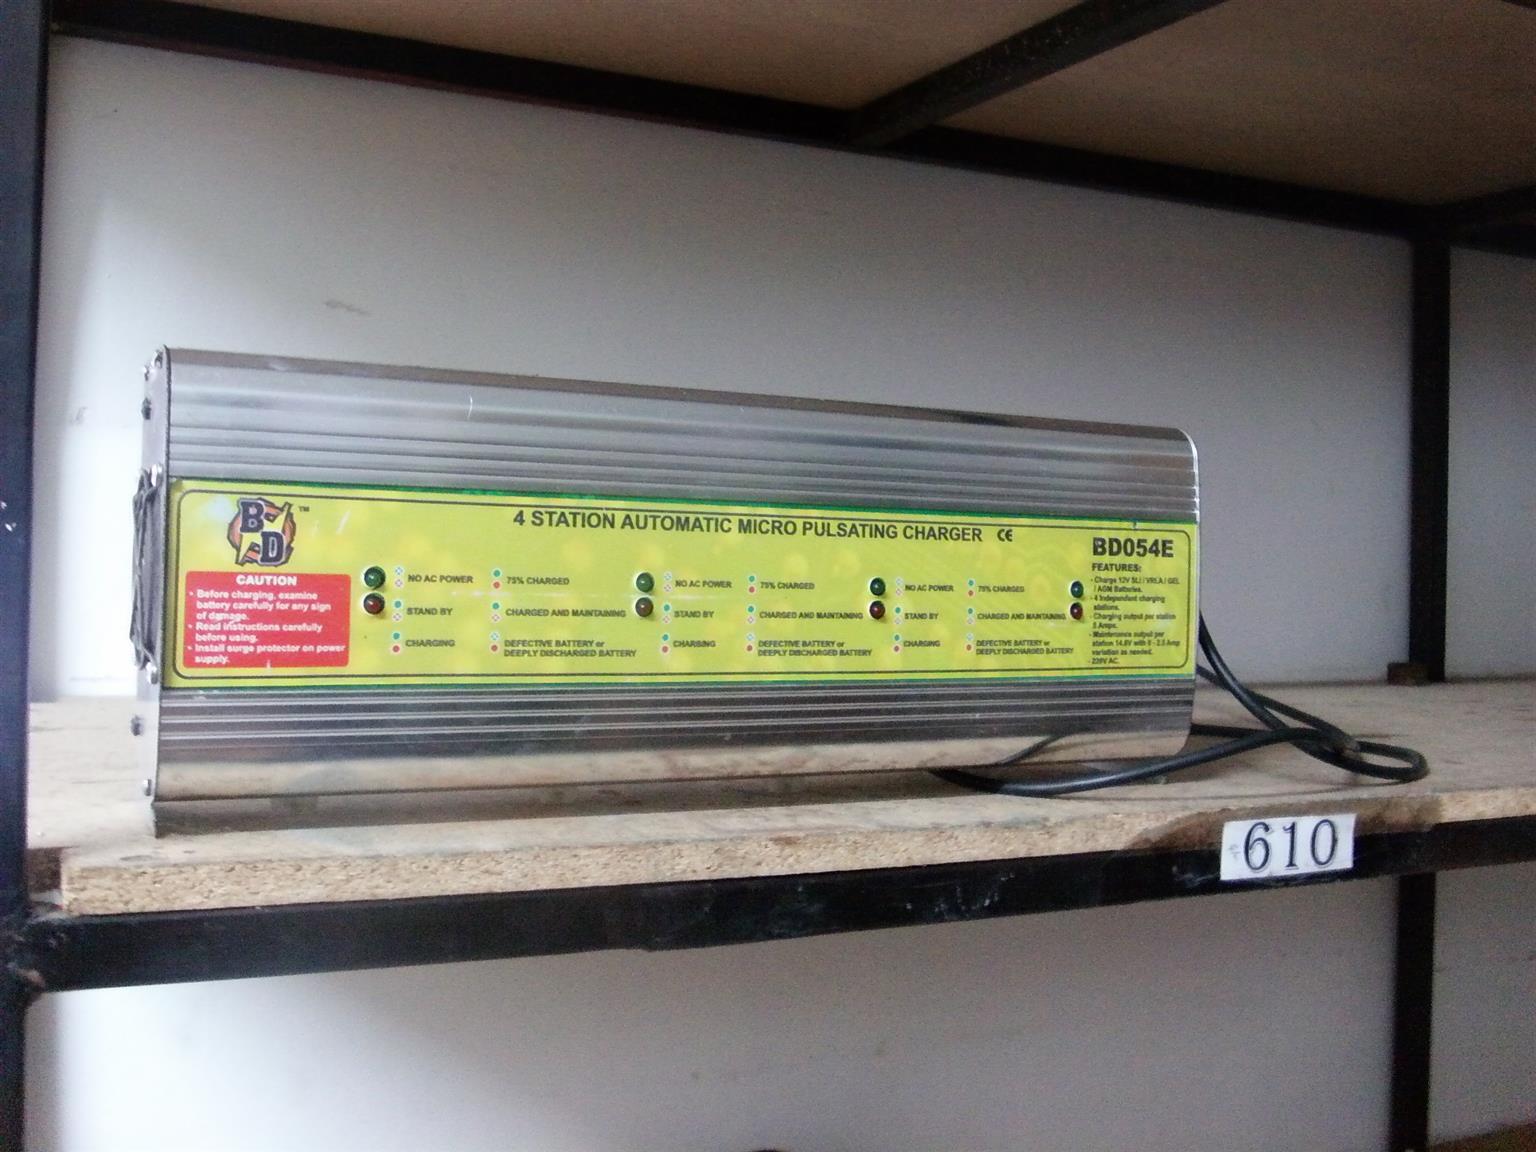 Battery Reconditioning training & Equipment